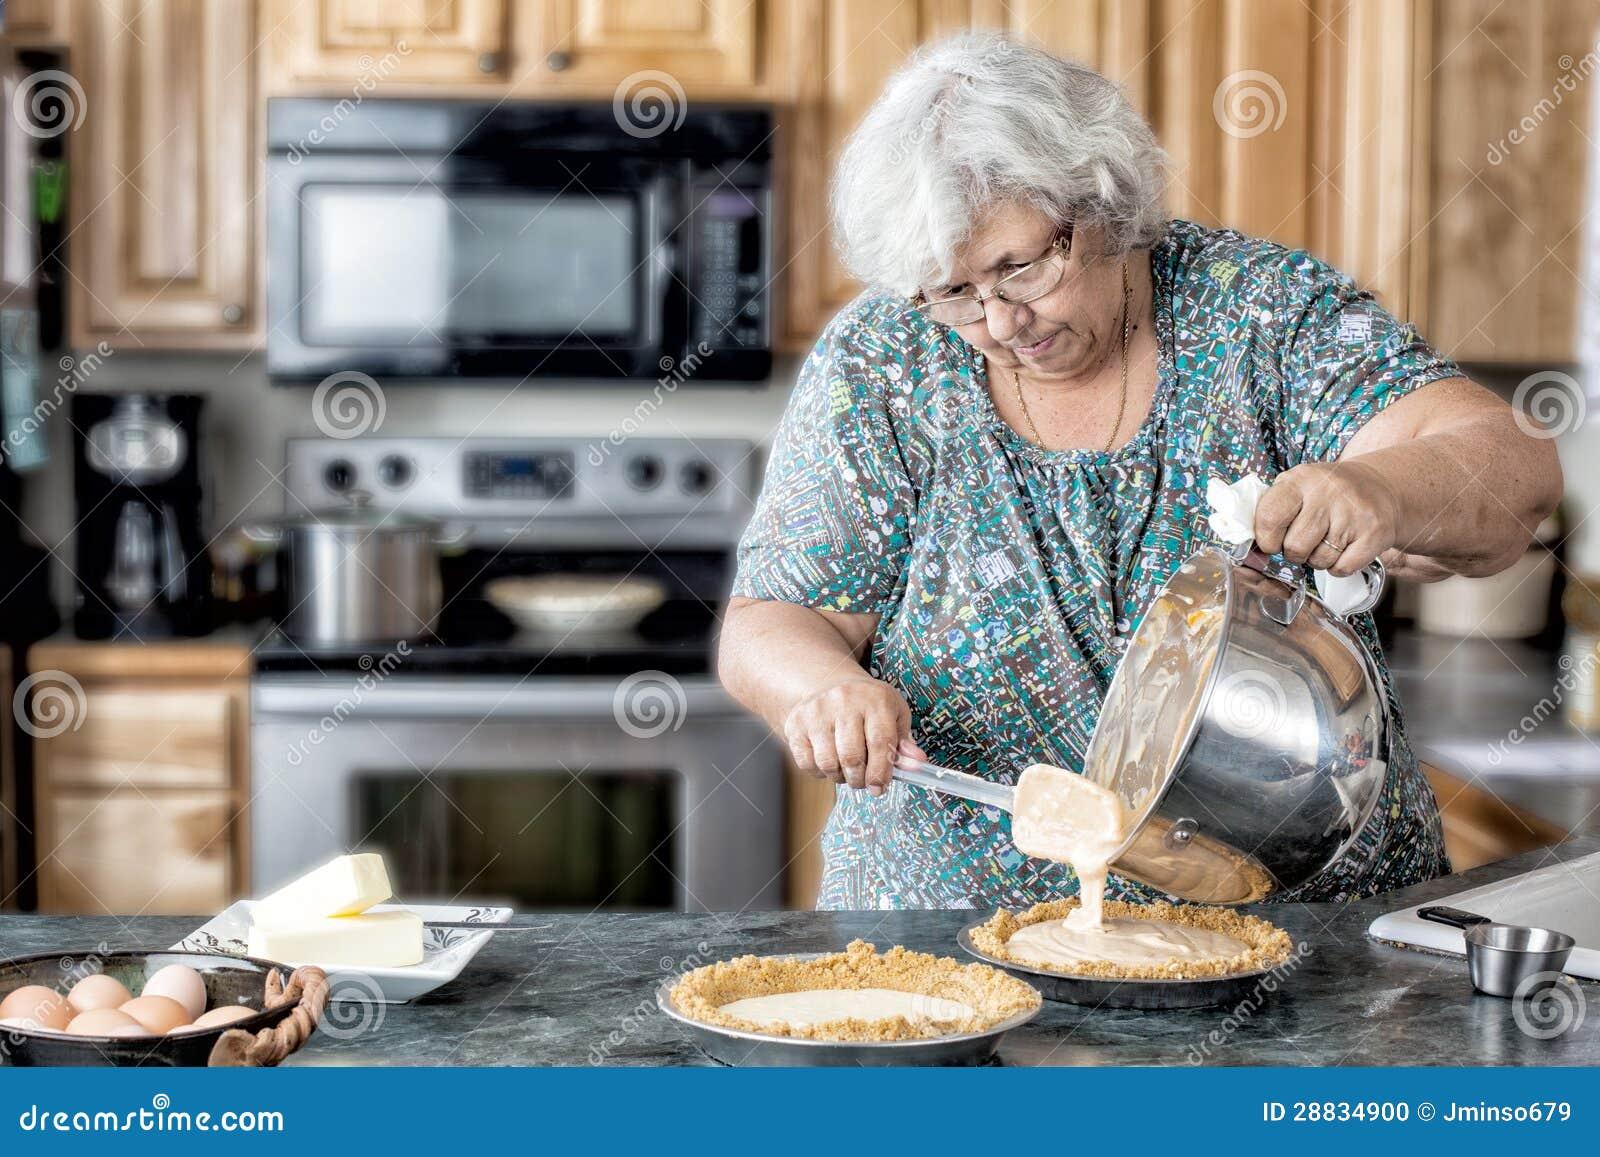 С бабушкой на кухне 2 фотография